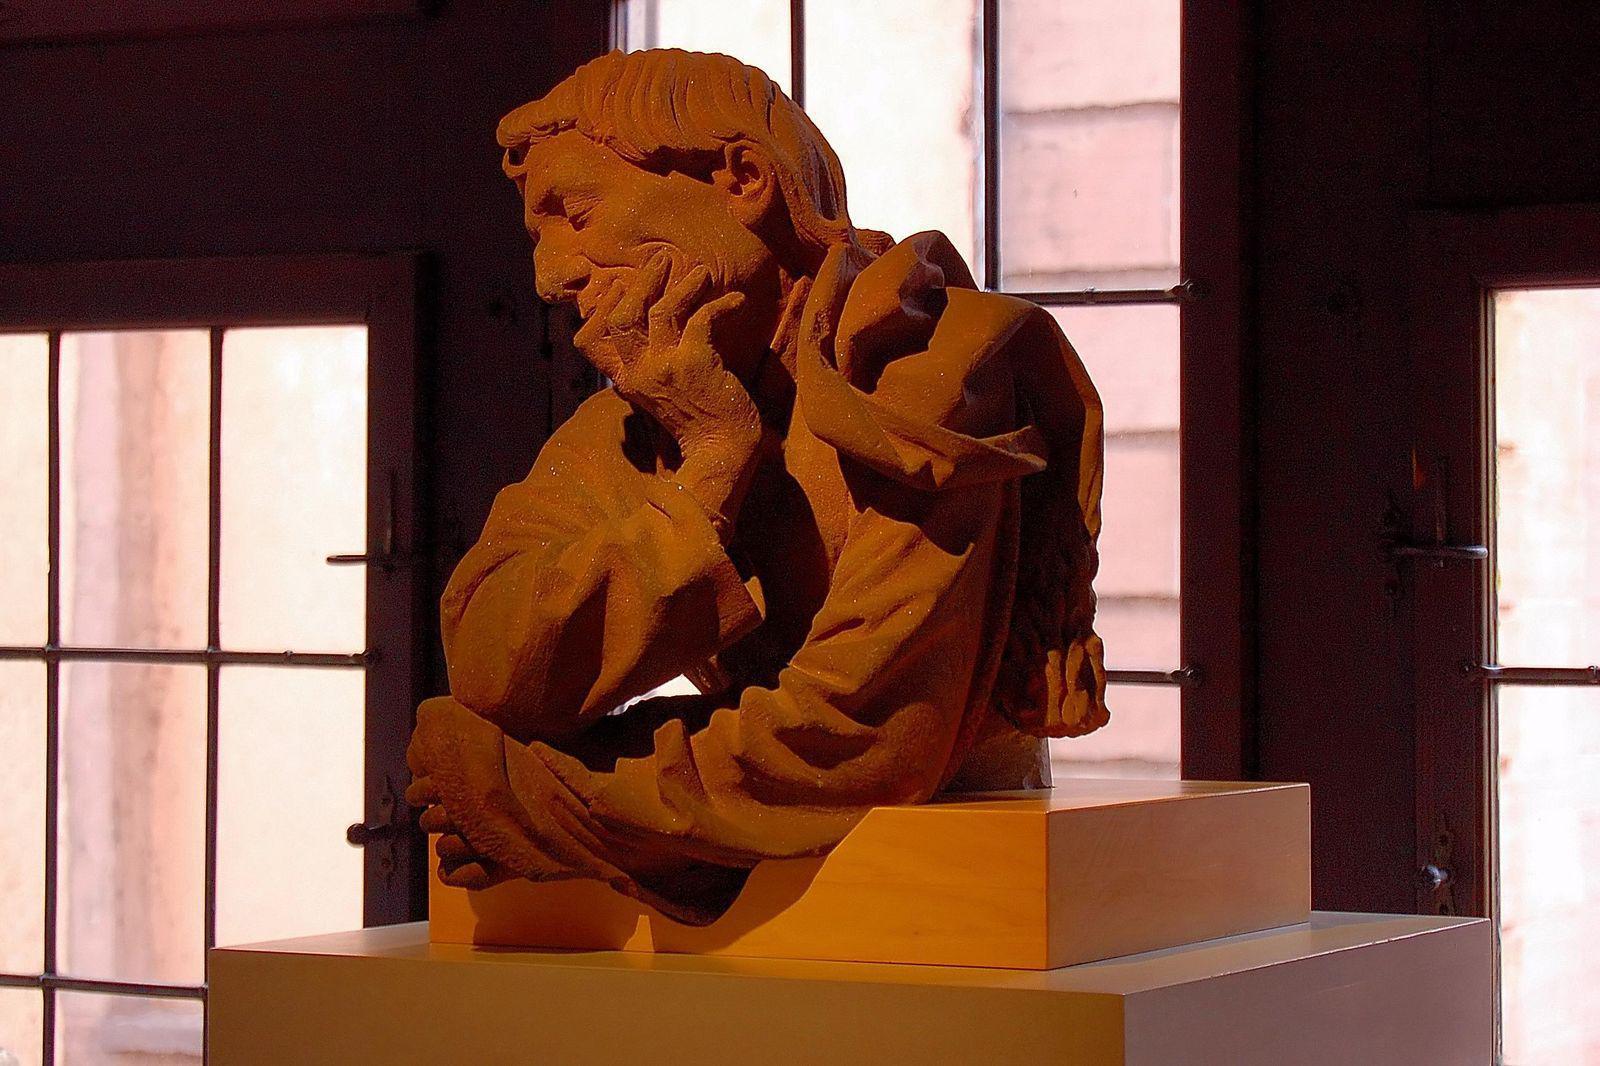 Musée de l'Oeuvre Notre-Dame_Strasbourg